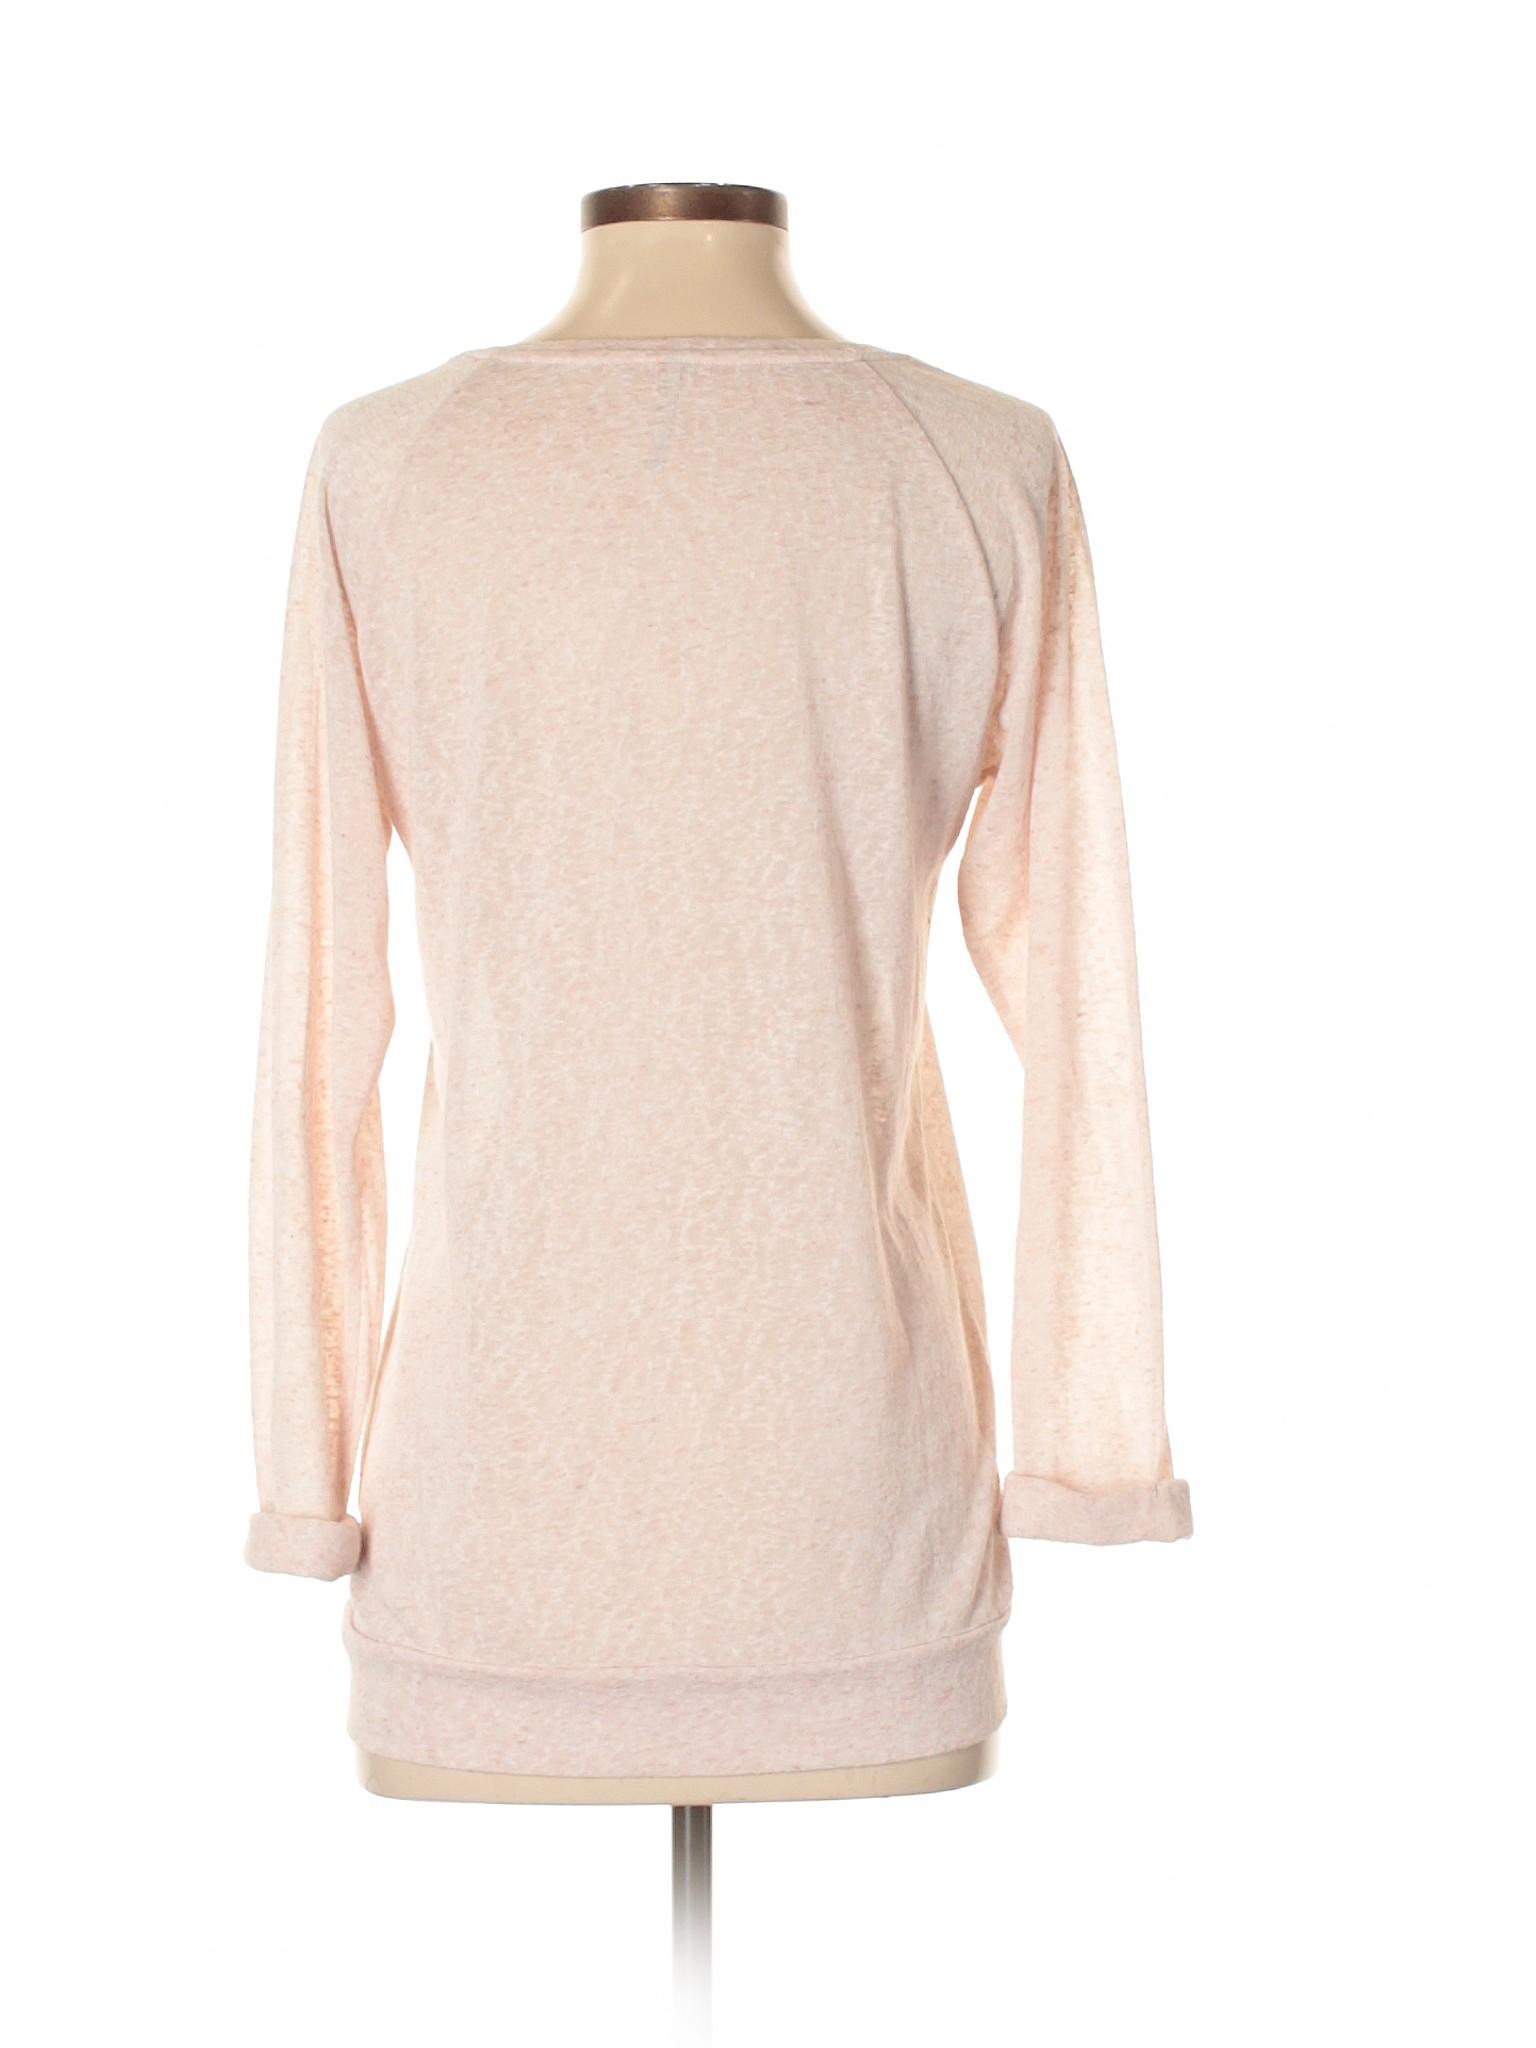 Boutique Color Thread winter Pullover Sweater p7qUnZTp